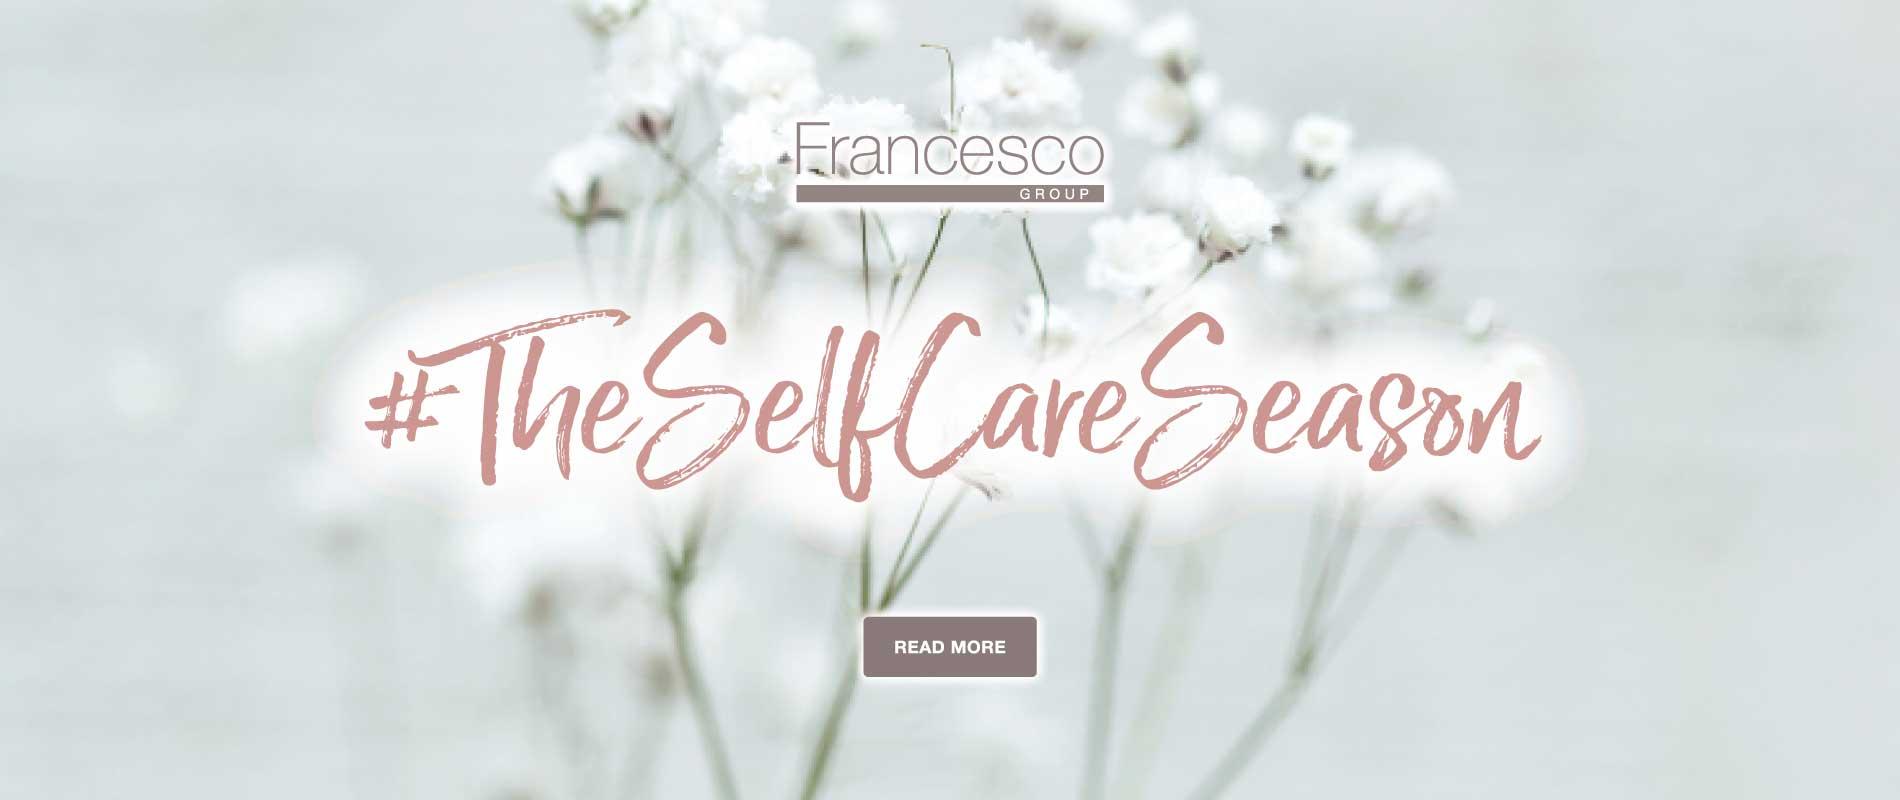 #The Self Care Season - Francesco Group